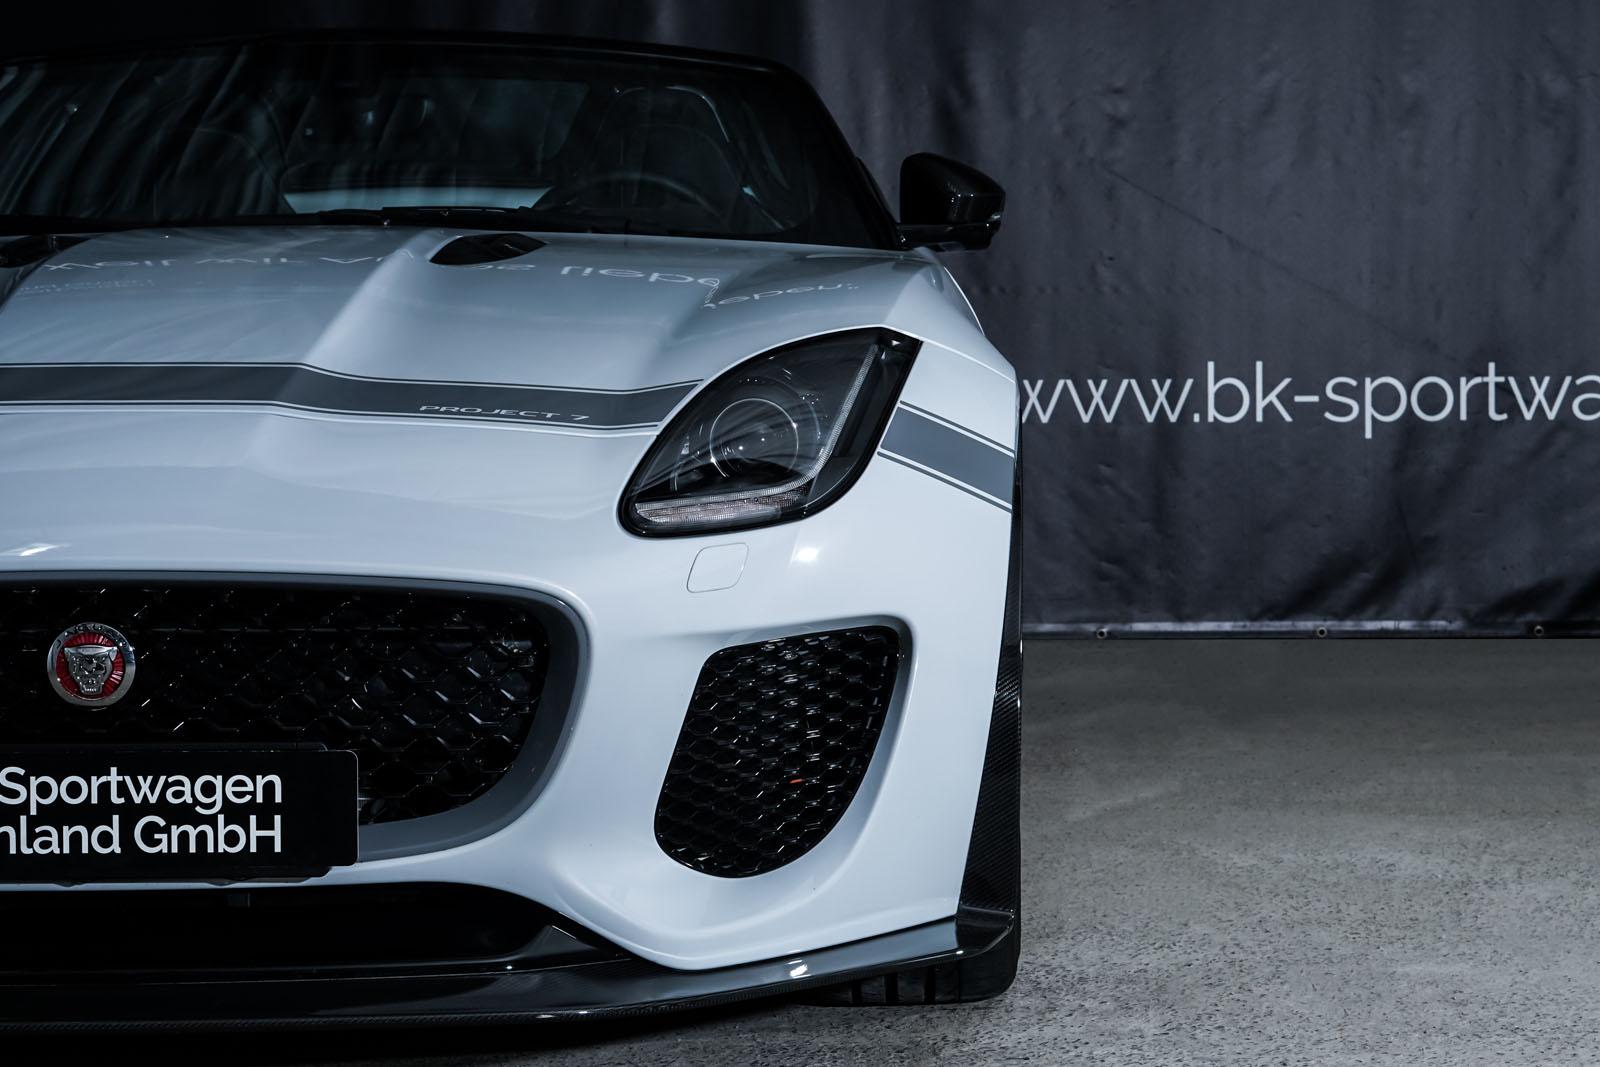 Jaguar_Project7_Weiss_Schwarz_JAG-0829_18_w